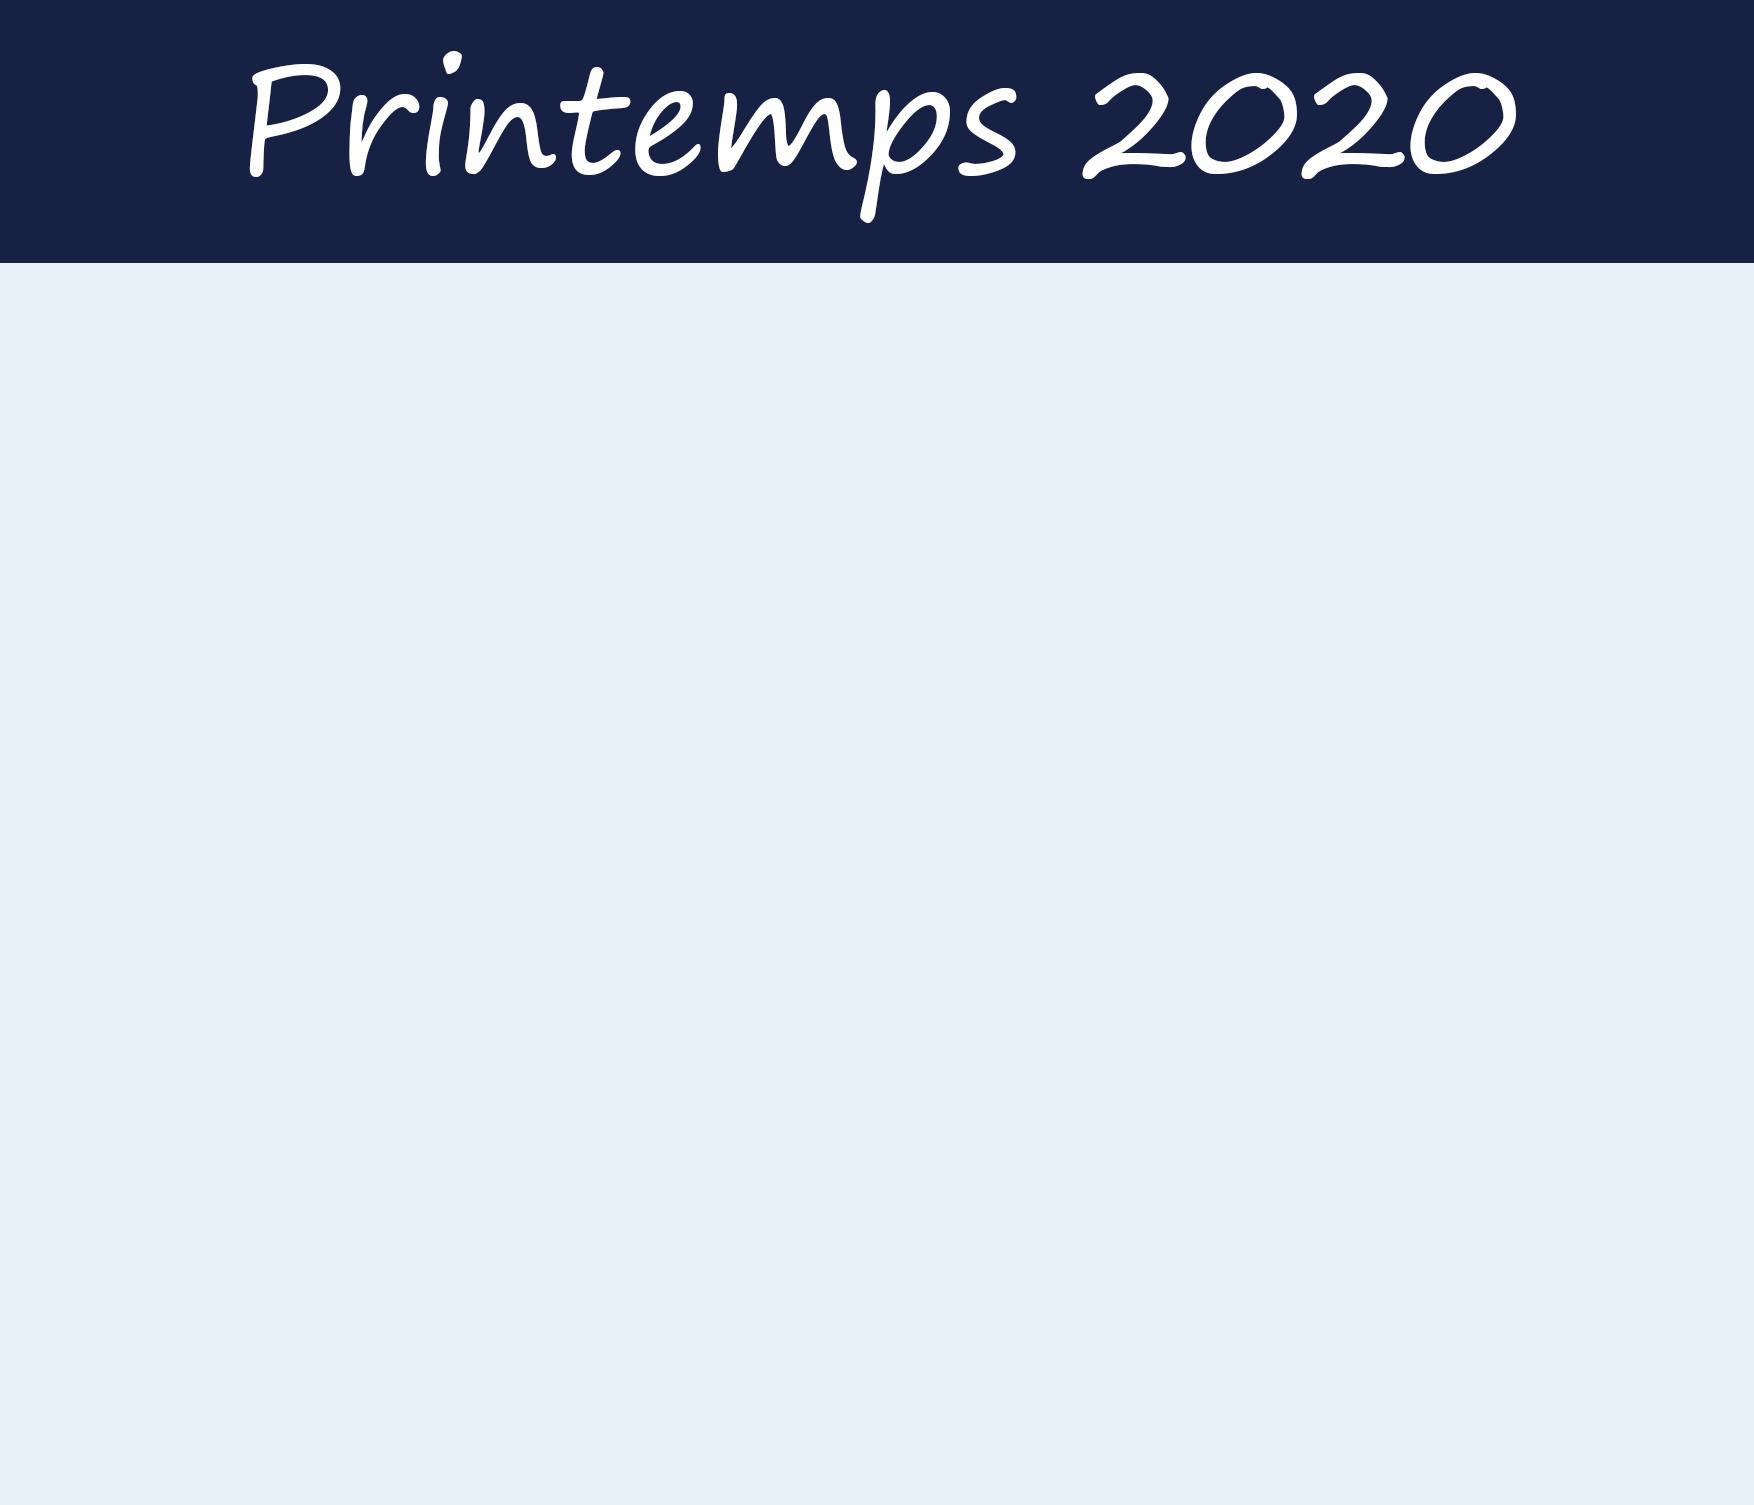 Printempsr2020.jpg